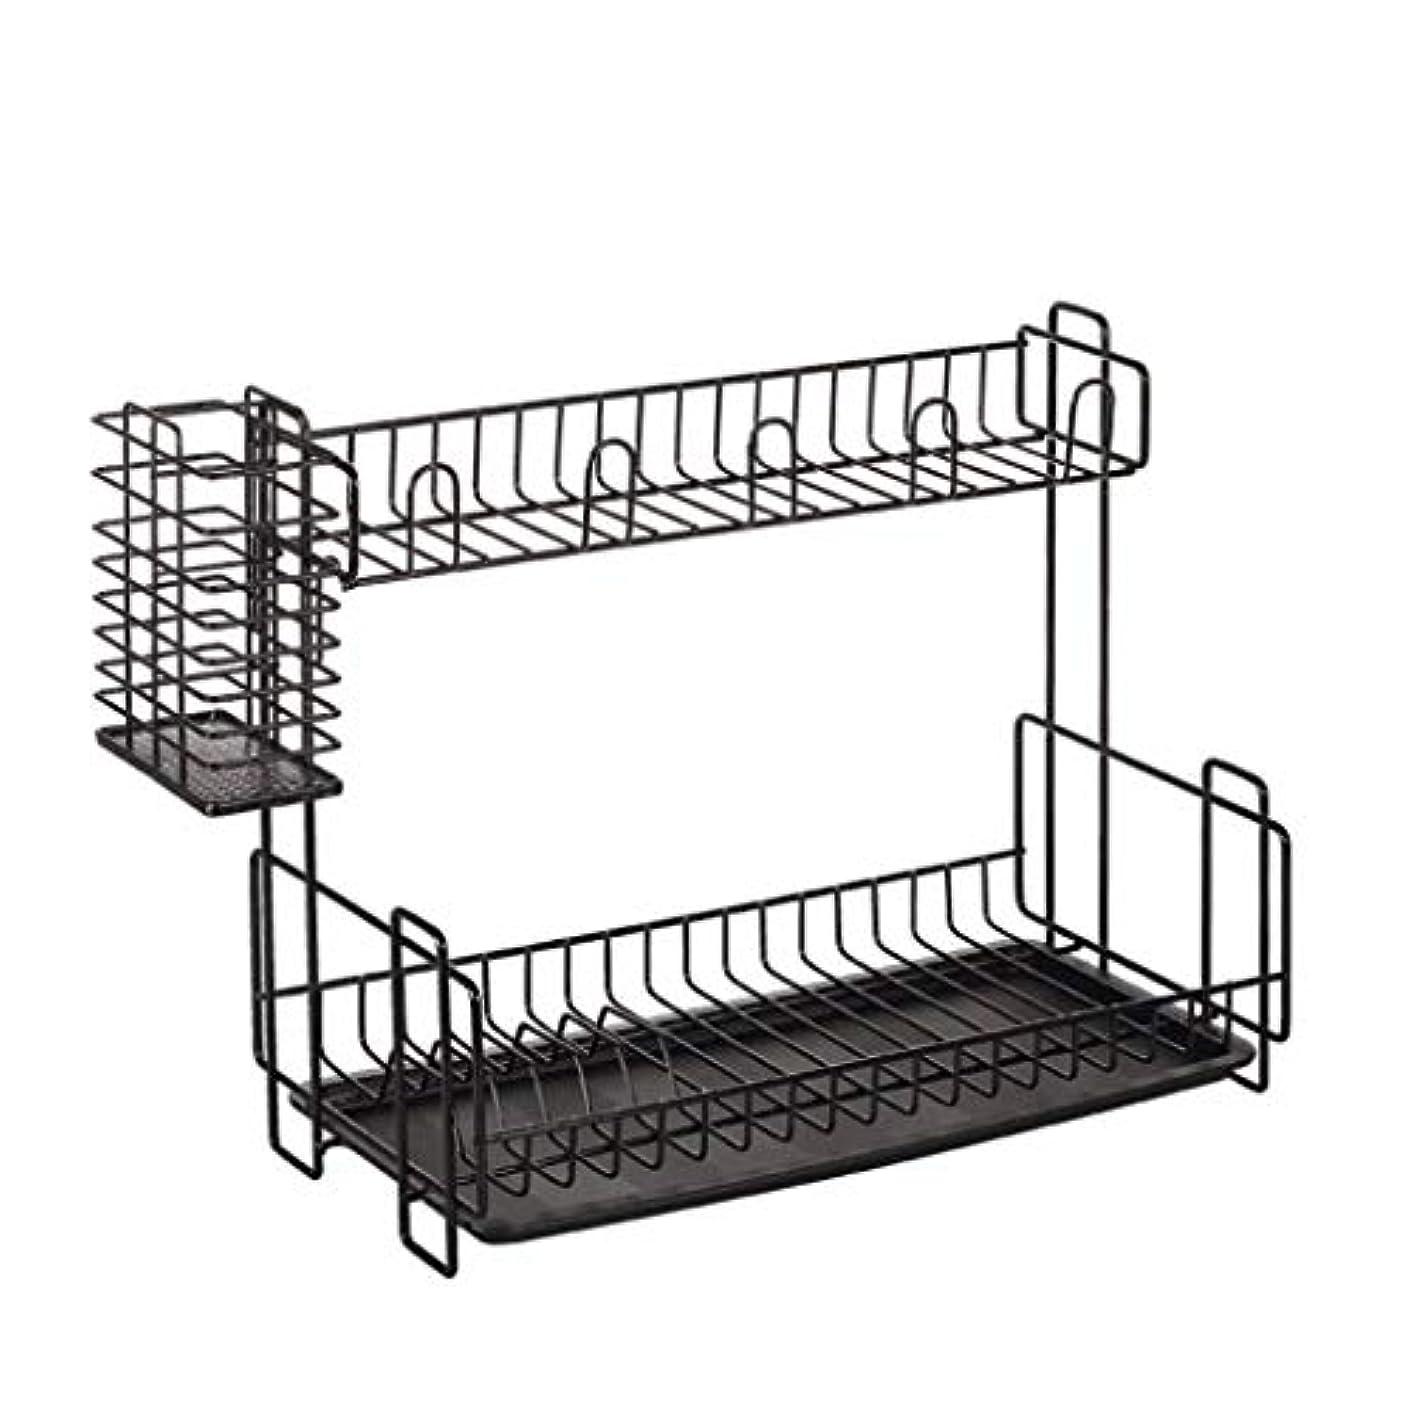 RDMZ Dish Drainer Rack Kitchen Sink 2 Layer Utensil Storage Shelf Rust Proof Draining Rack Black 39x20x33cm